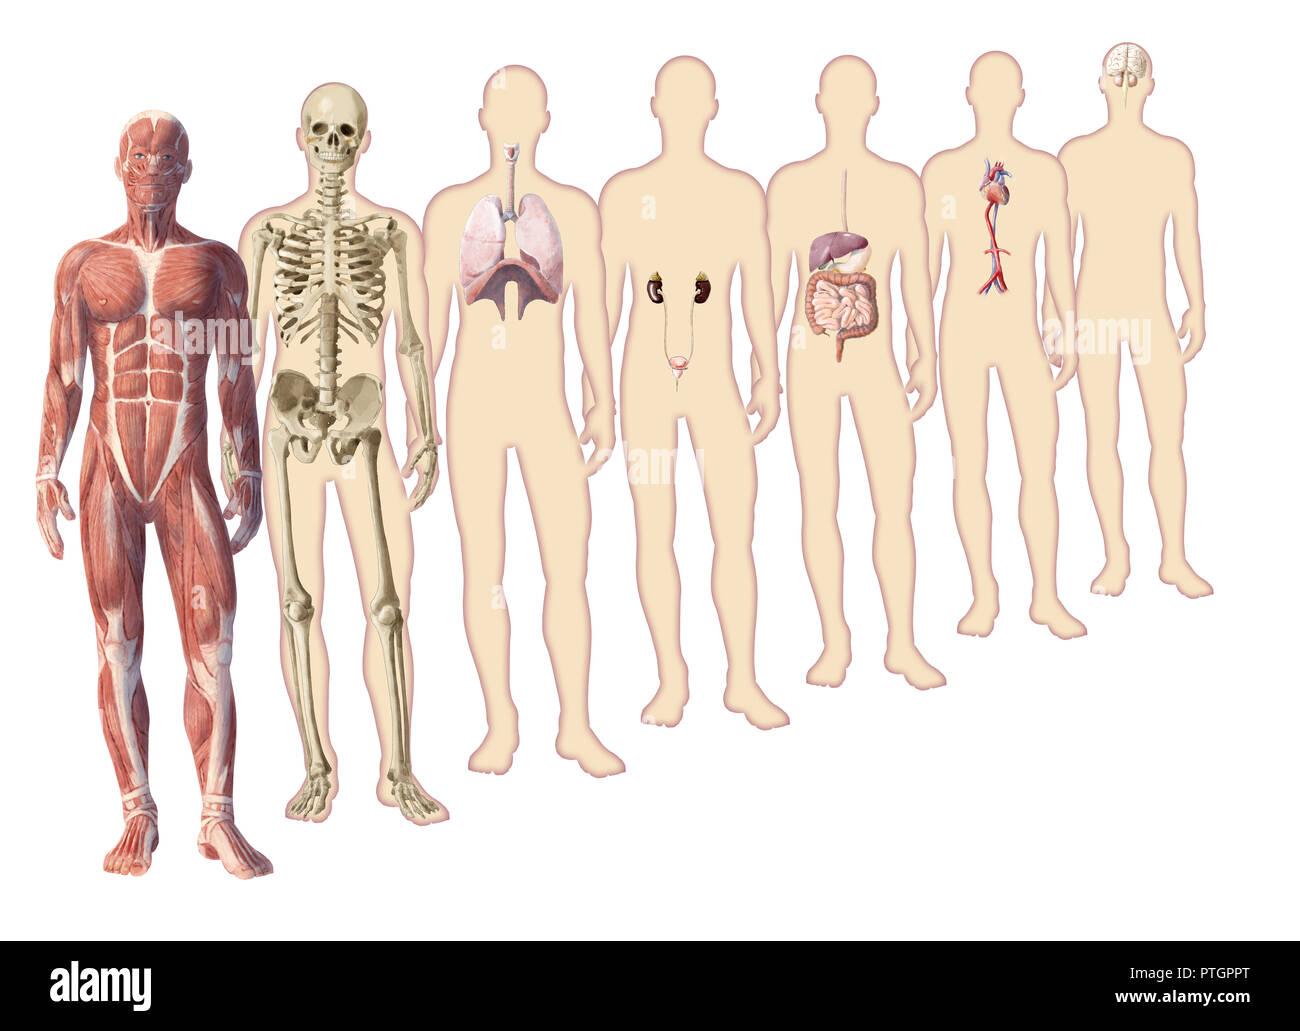 Digital Illustration Of Human Body Anatomy Stock Photo 221645280